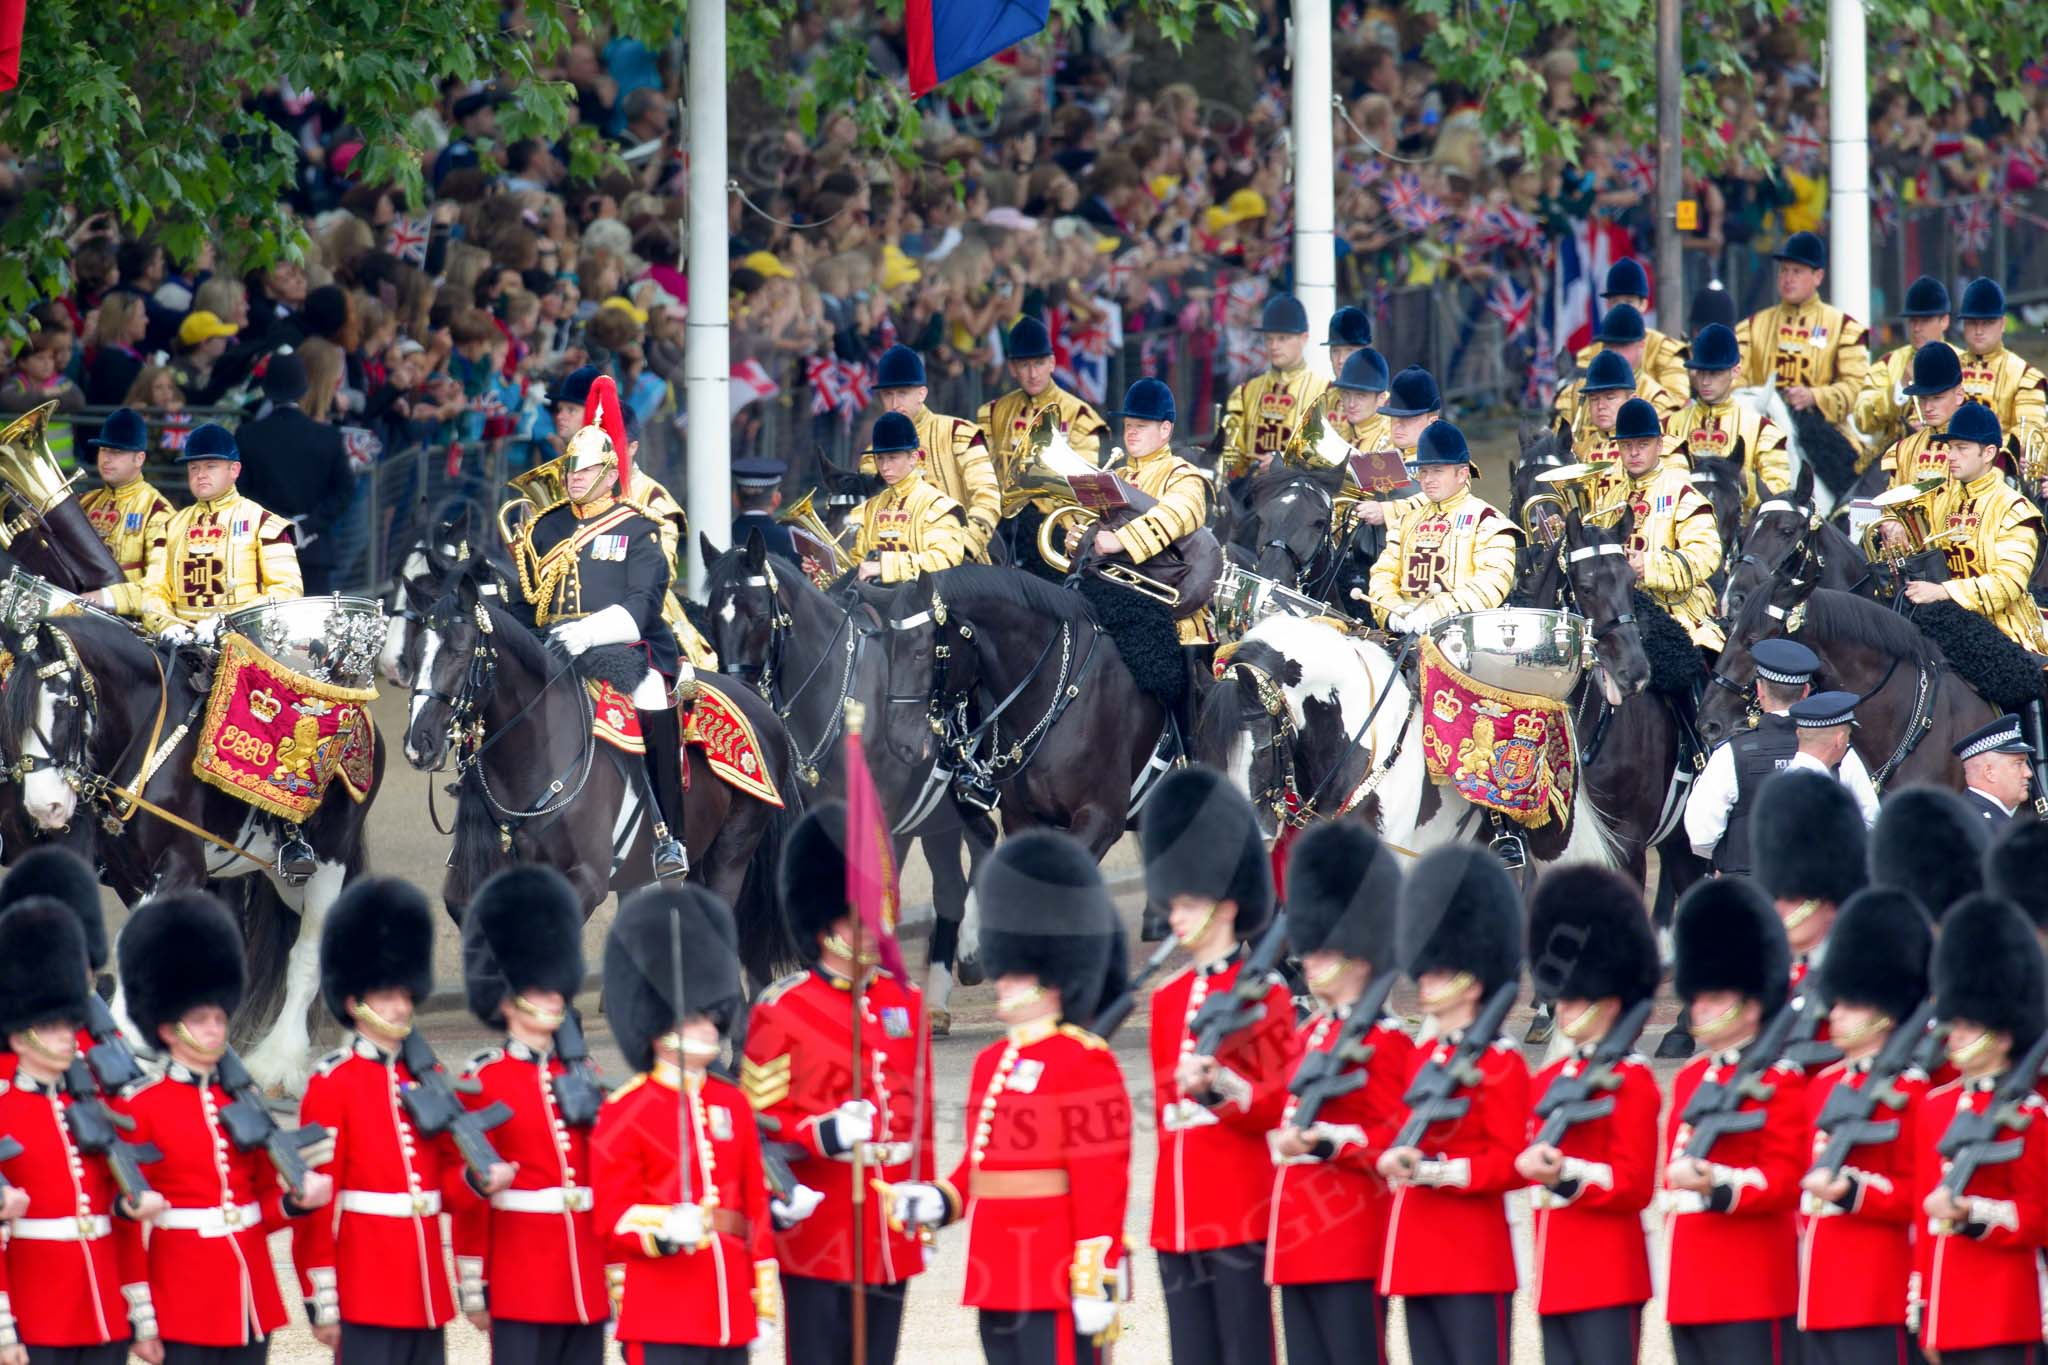 Queen's Birthday Parade 2010 - Trooping the Colour Photos ...